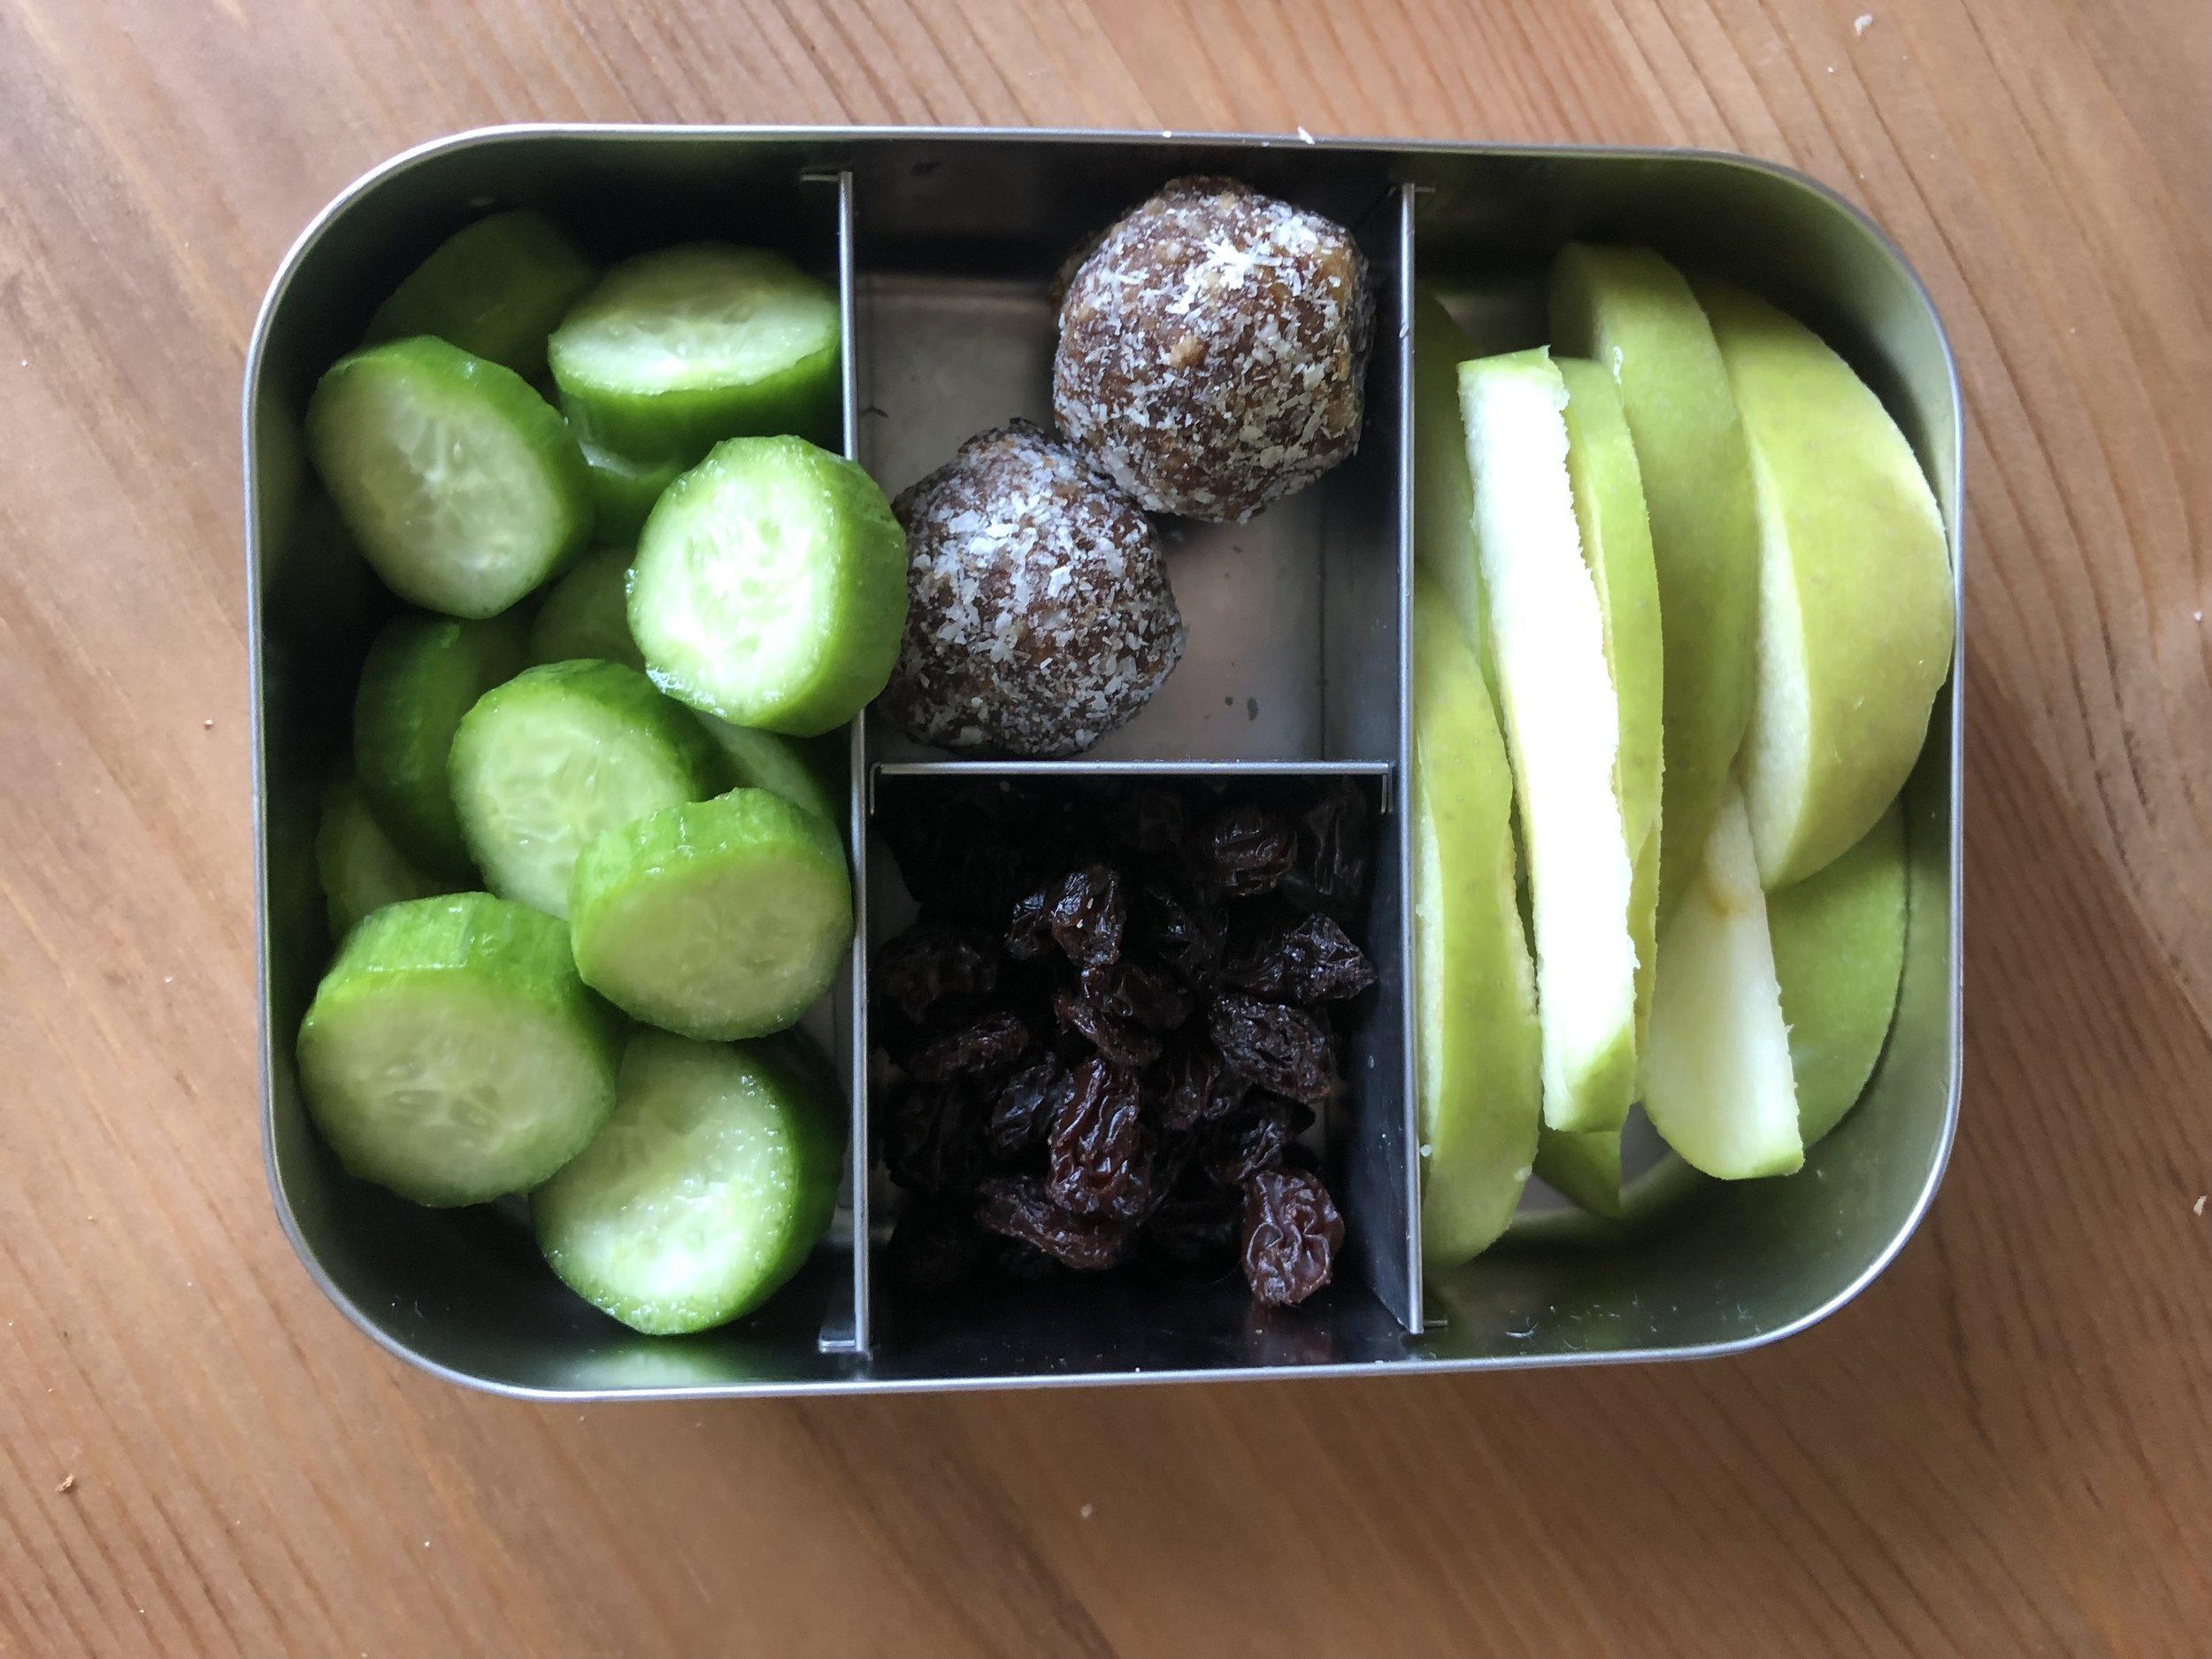 cucumbers, mango balls, raisins, apple slices